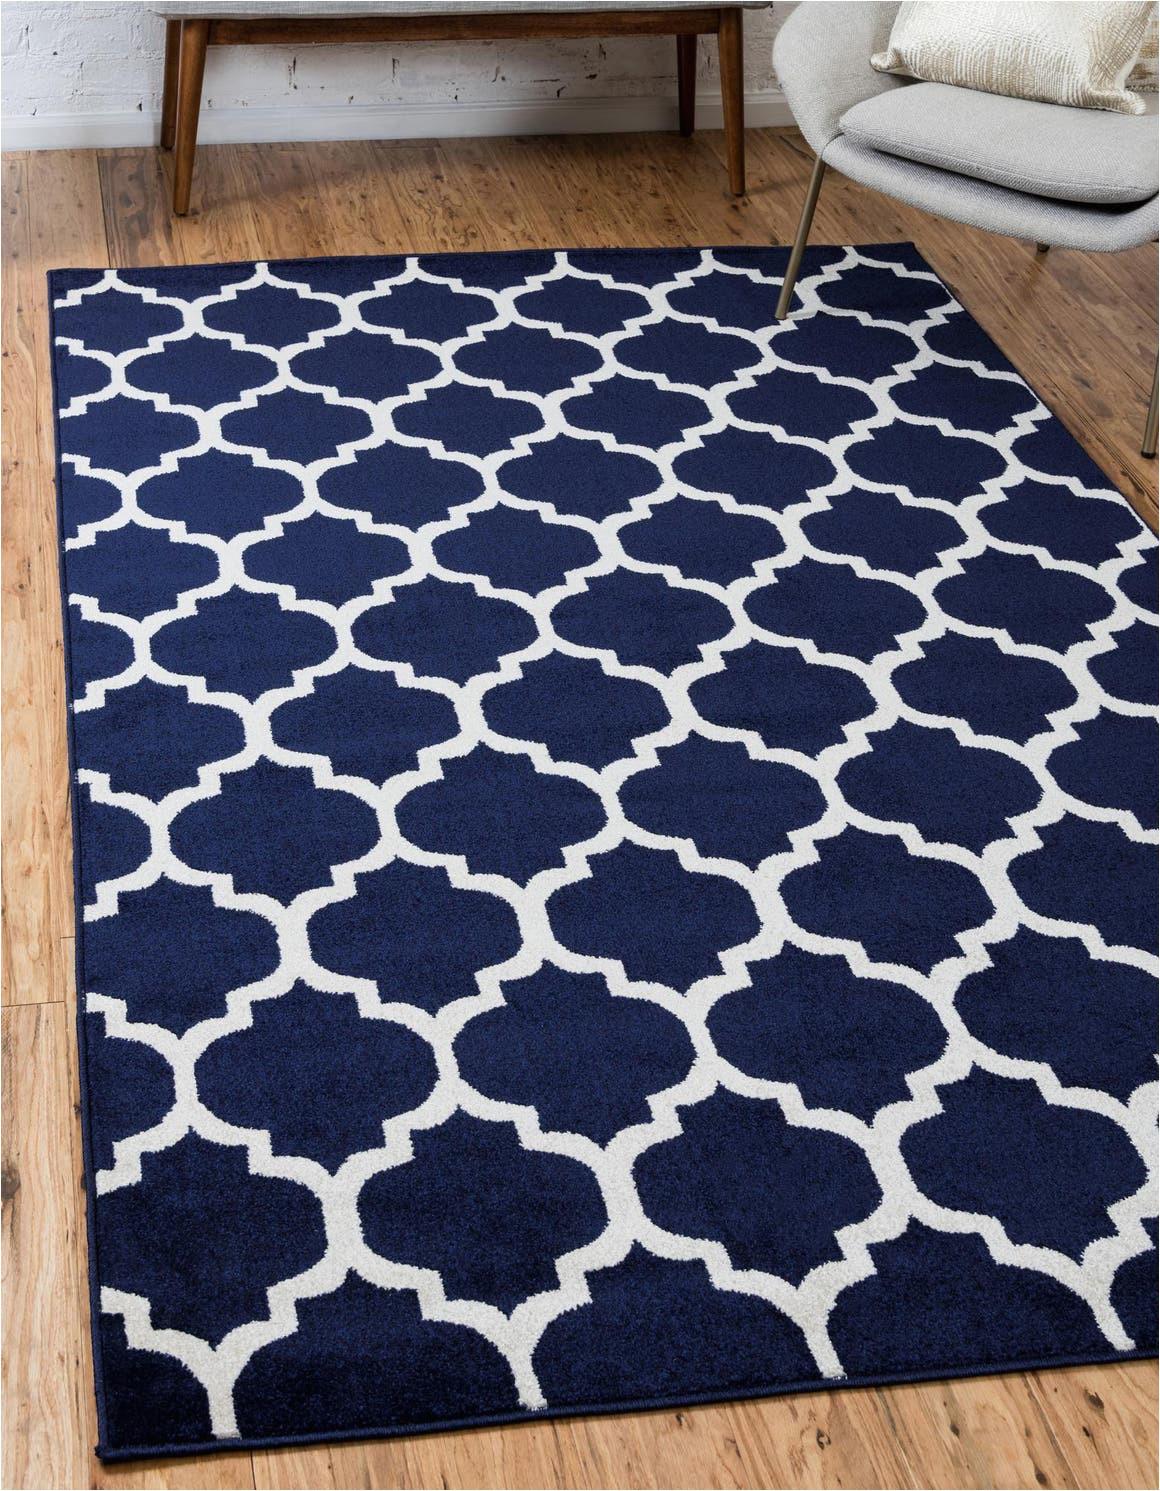 navy blue 12x16 trellis area rug